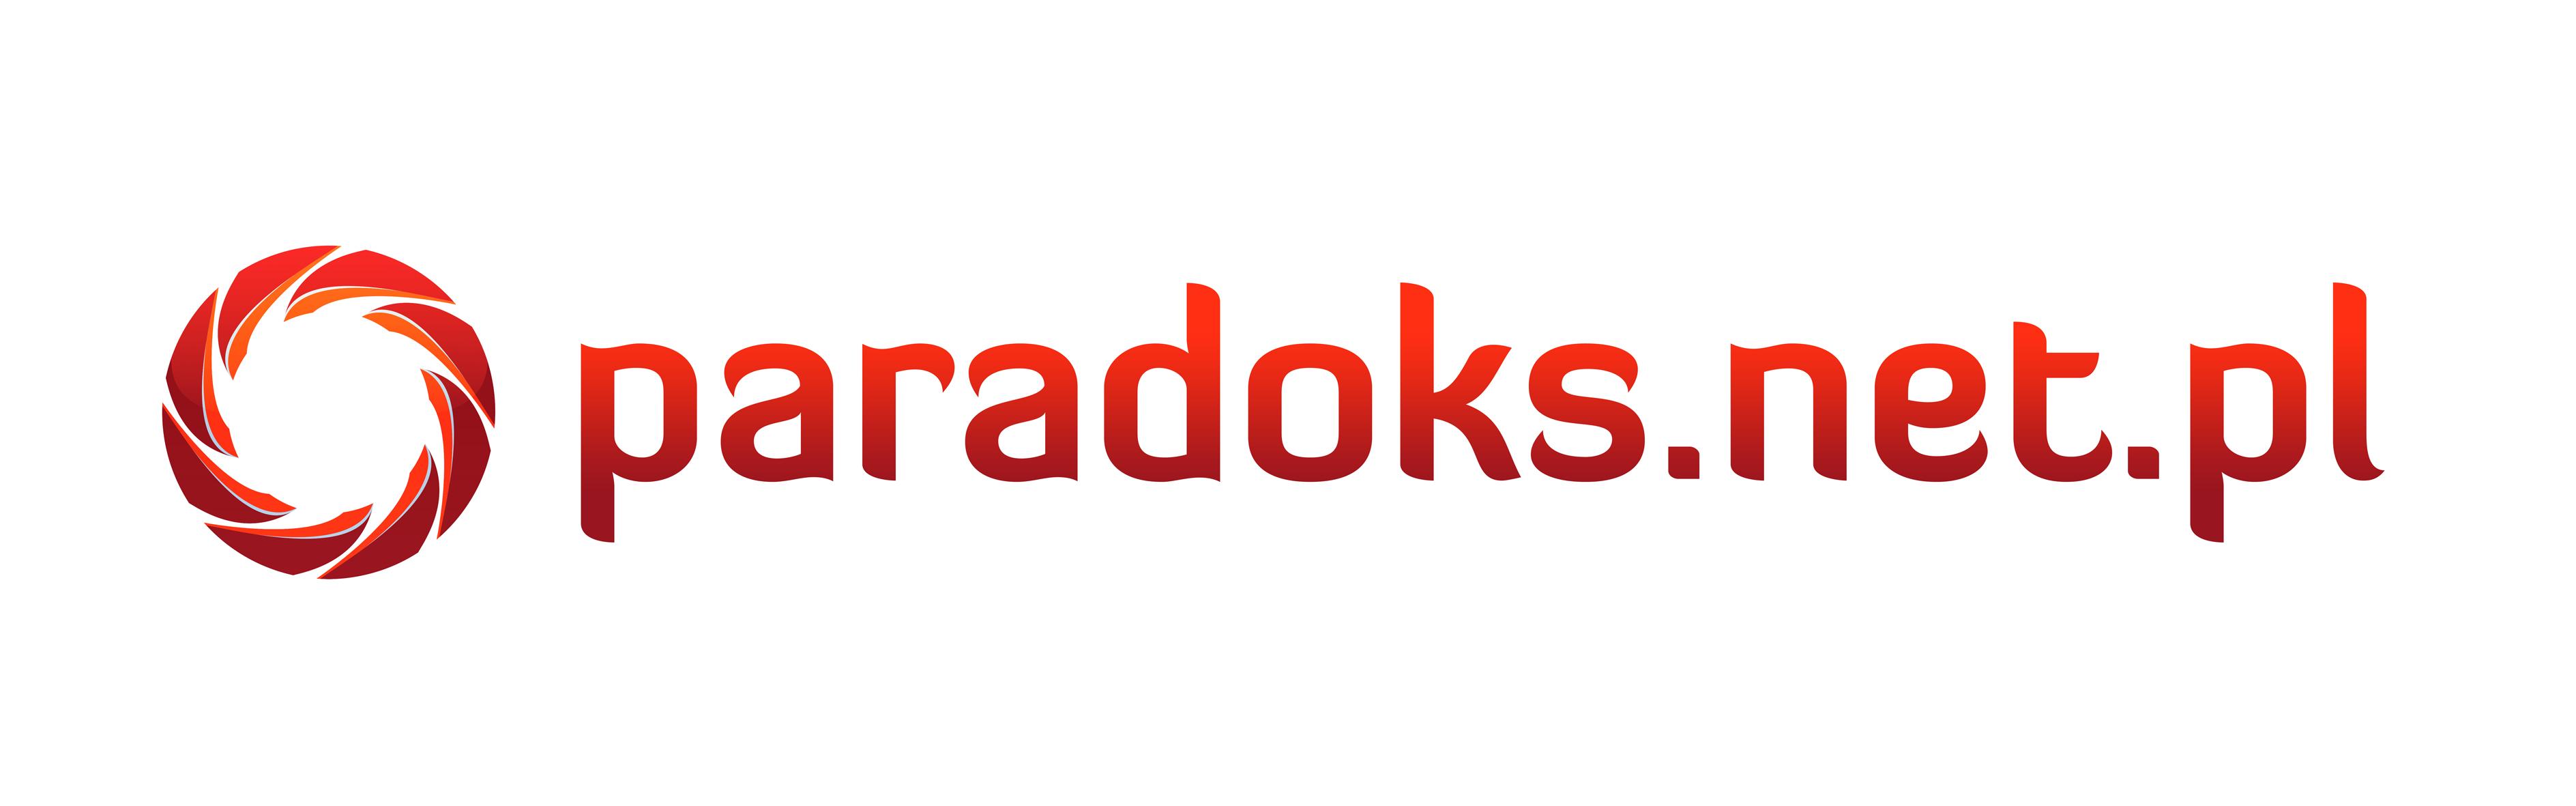 Znalezione obrazy dla zapytania paradoks.net logo